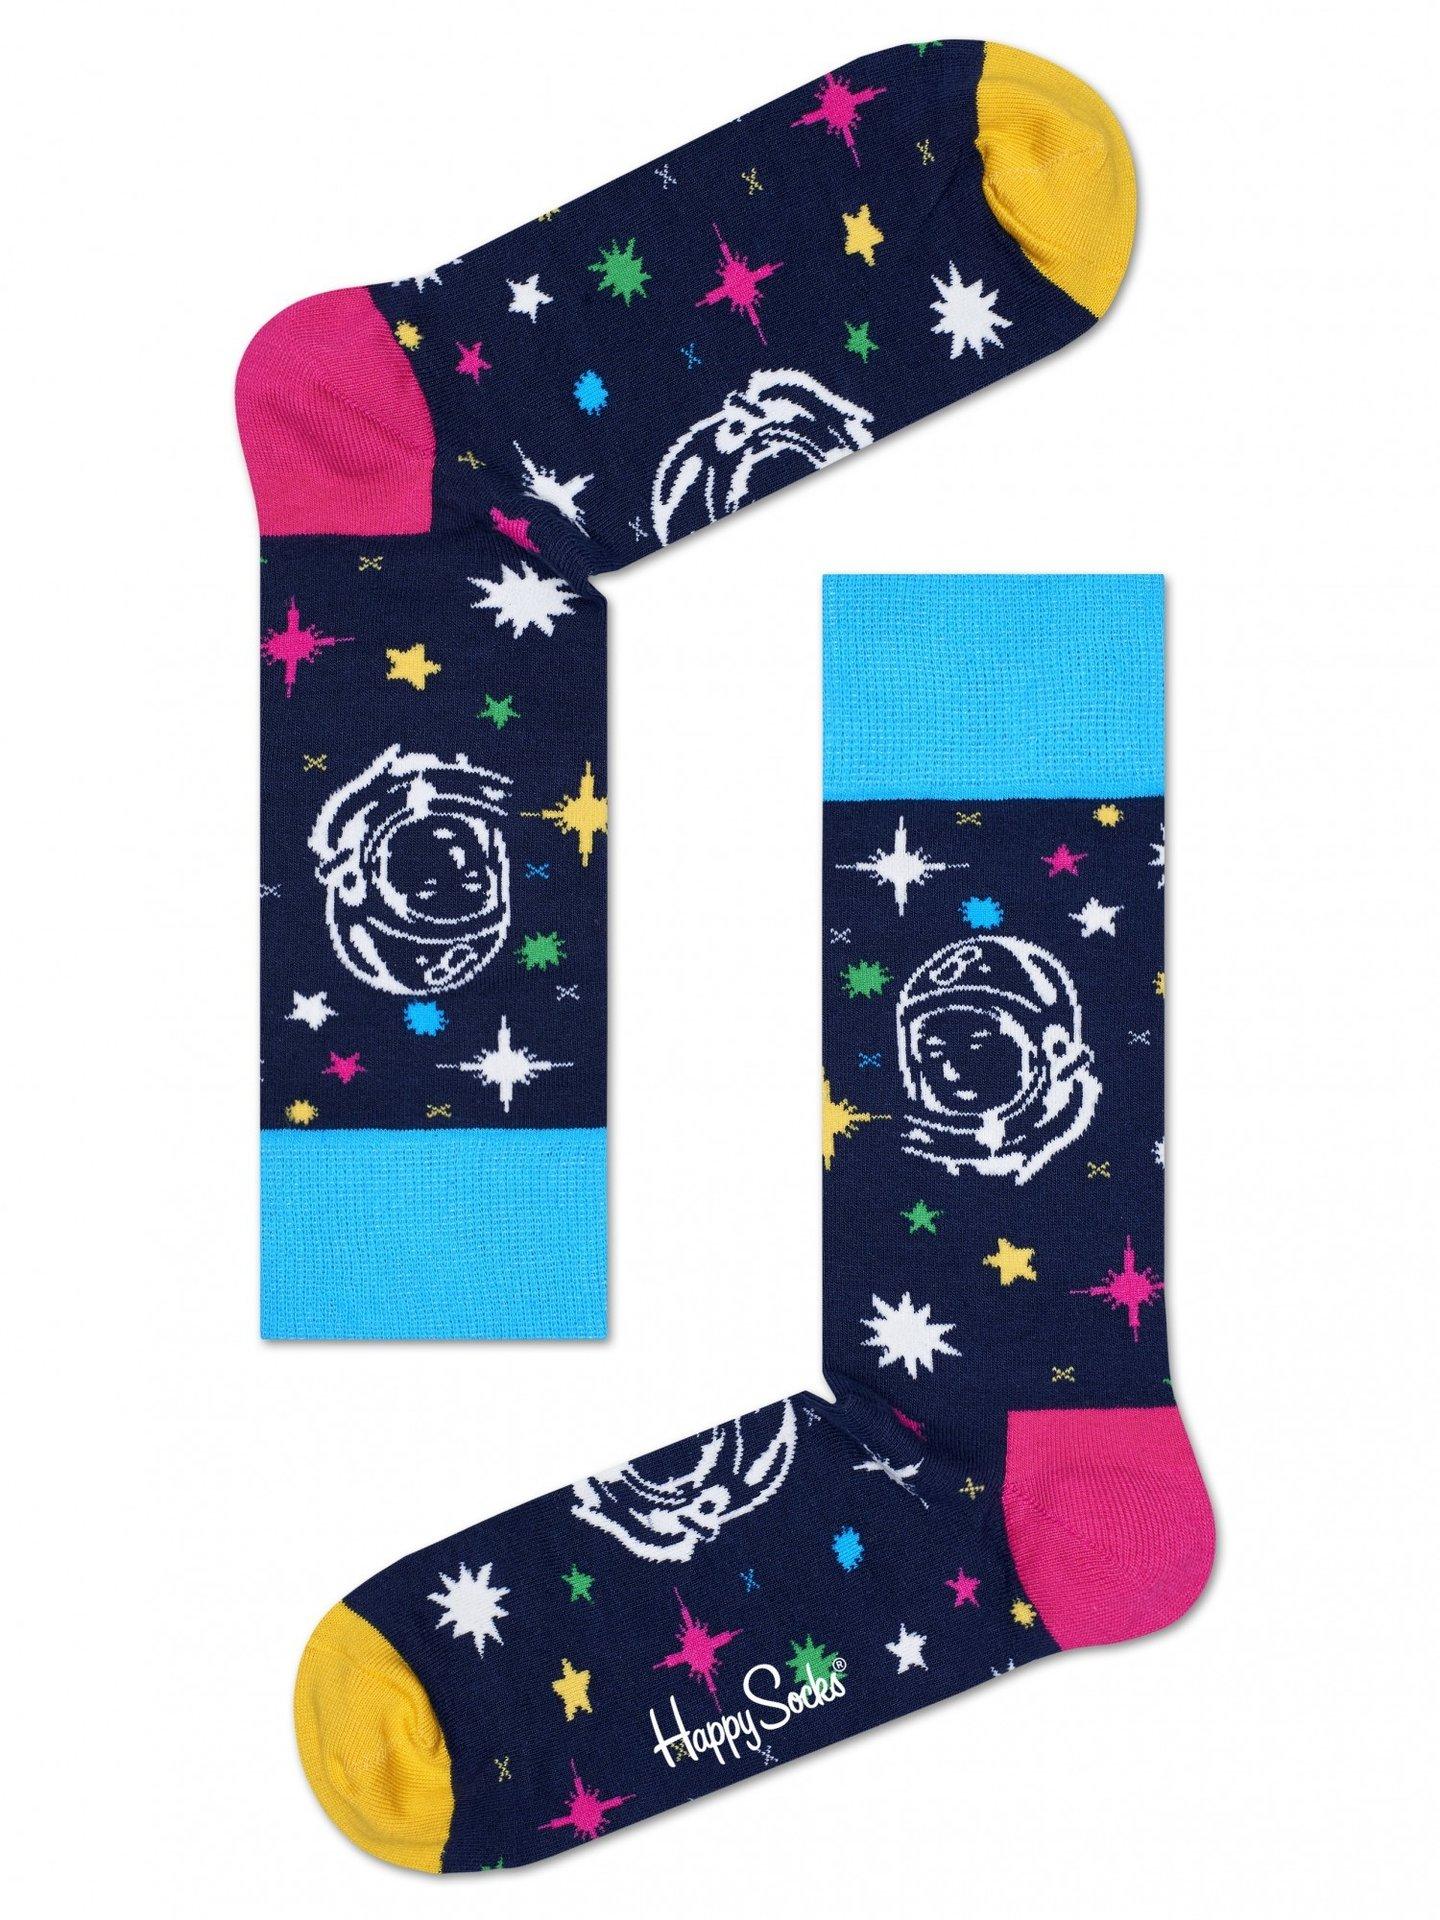 Happy socks 1 10,00€